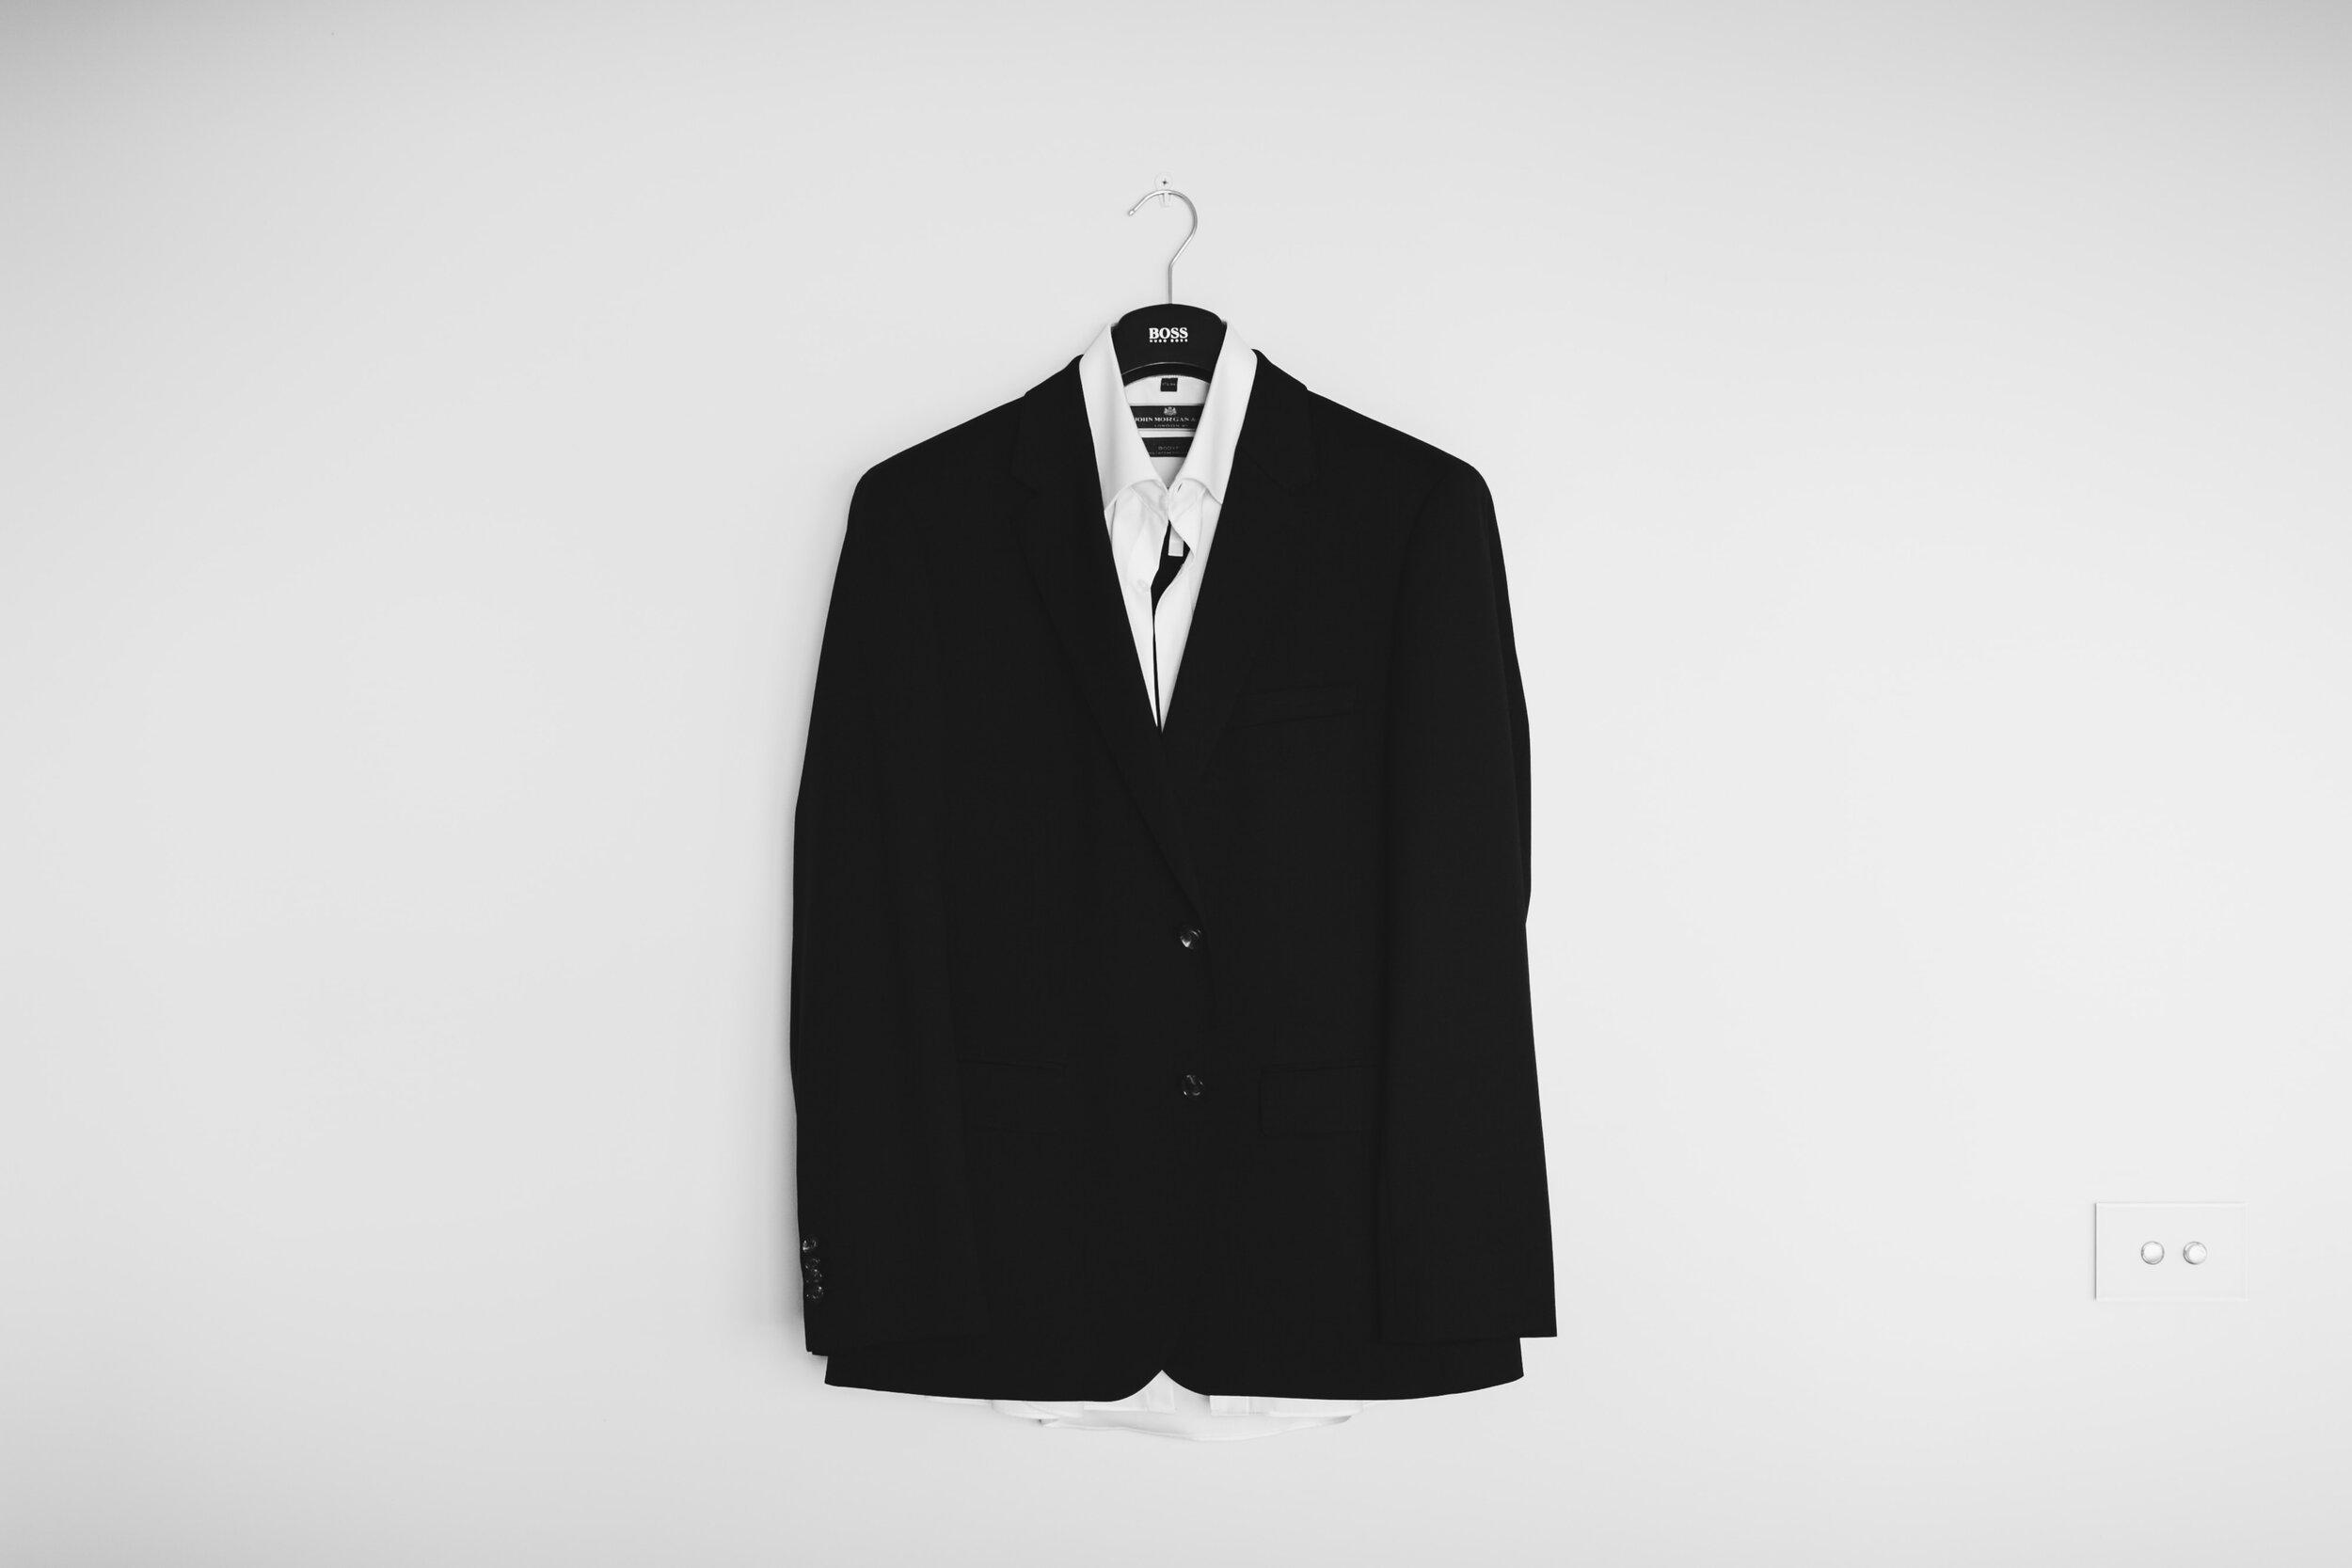 Men's suit and dress shirt